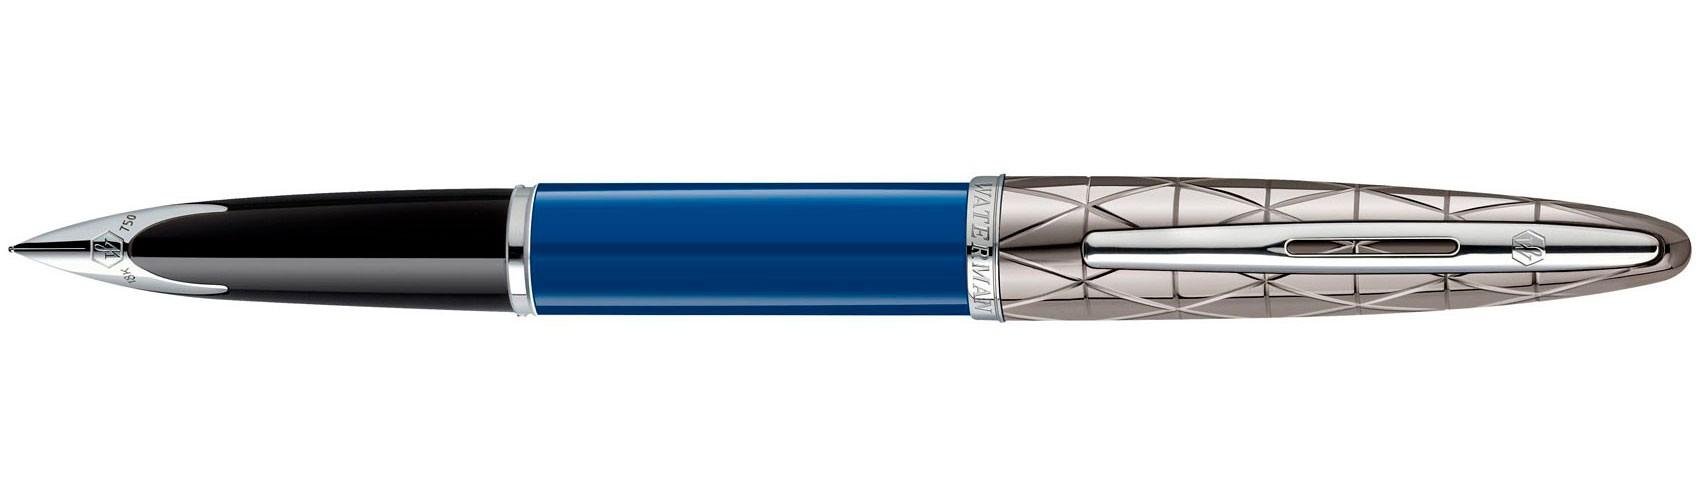 Перьевая ручка Waterman Carene Obsession Blue Lacquer